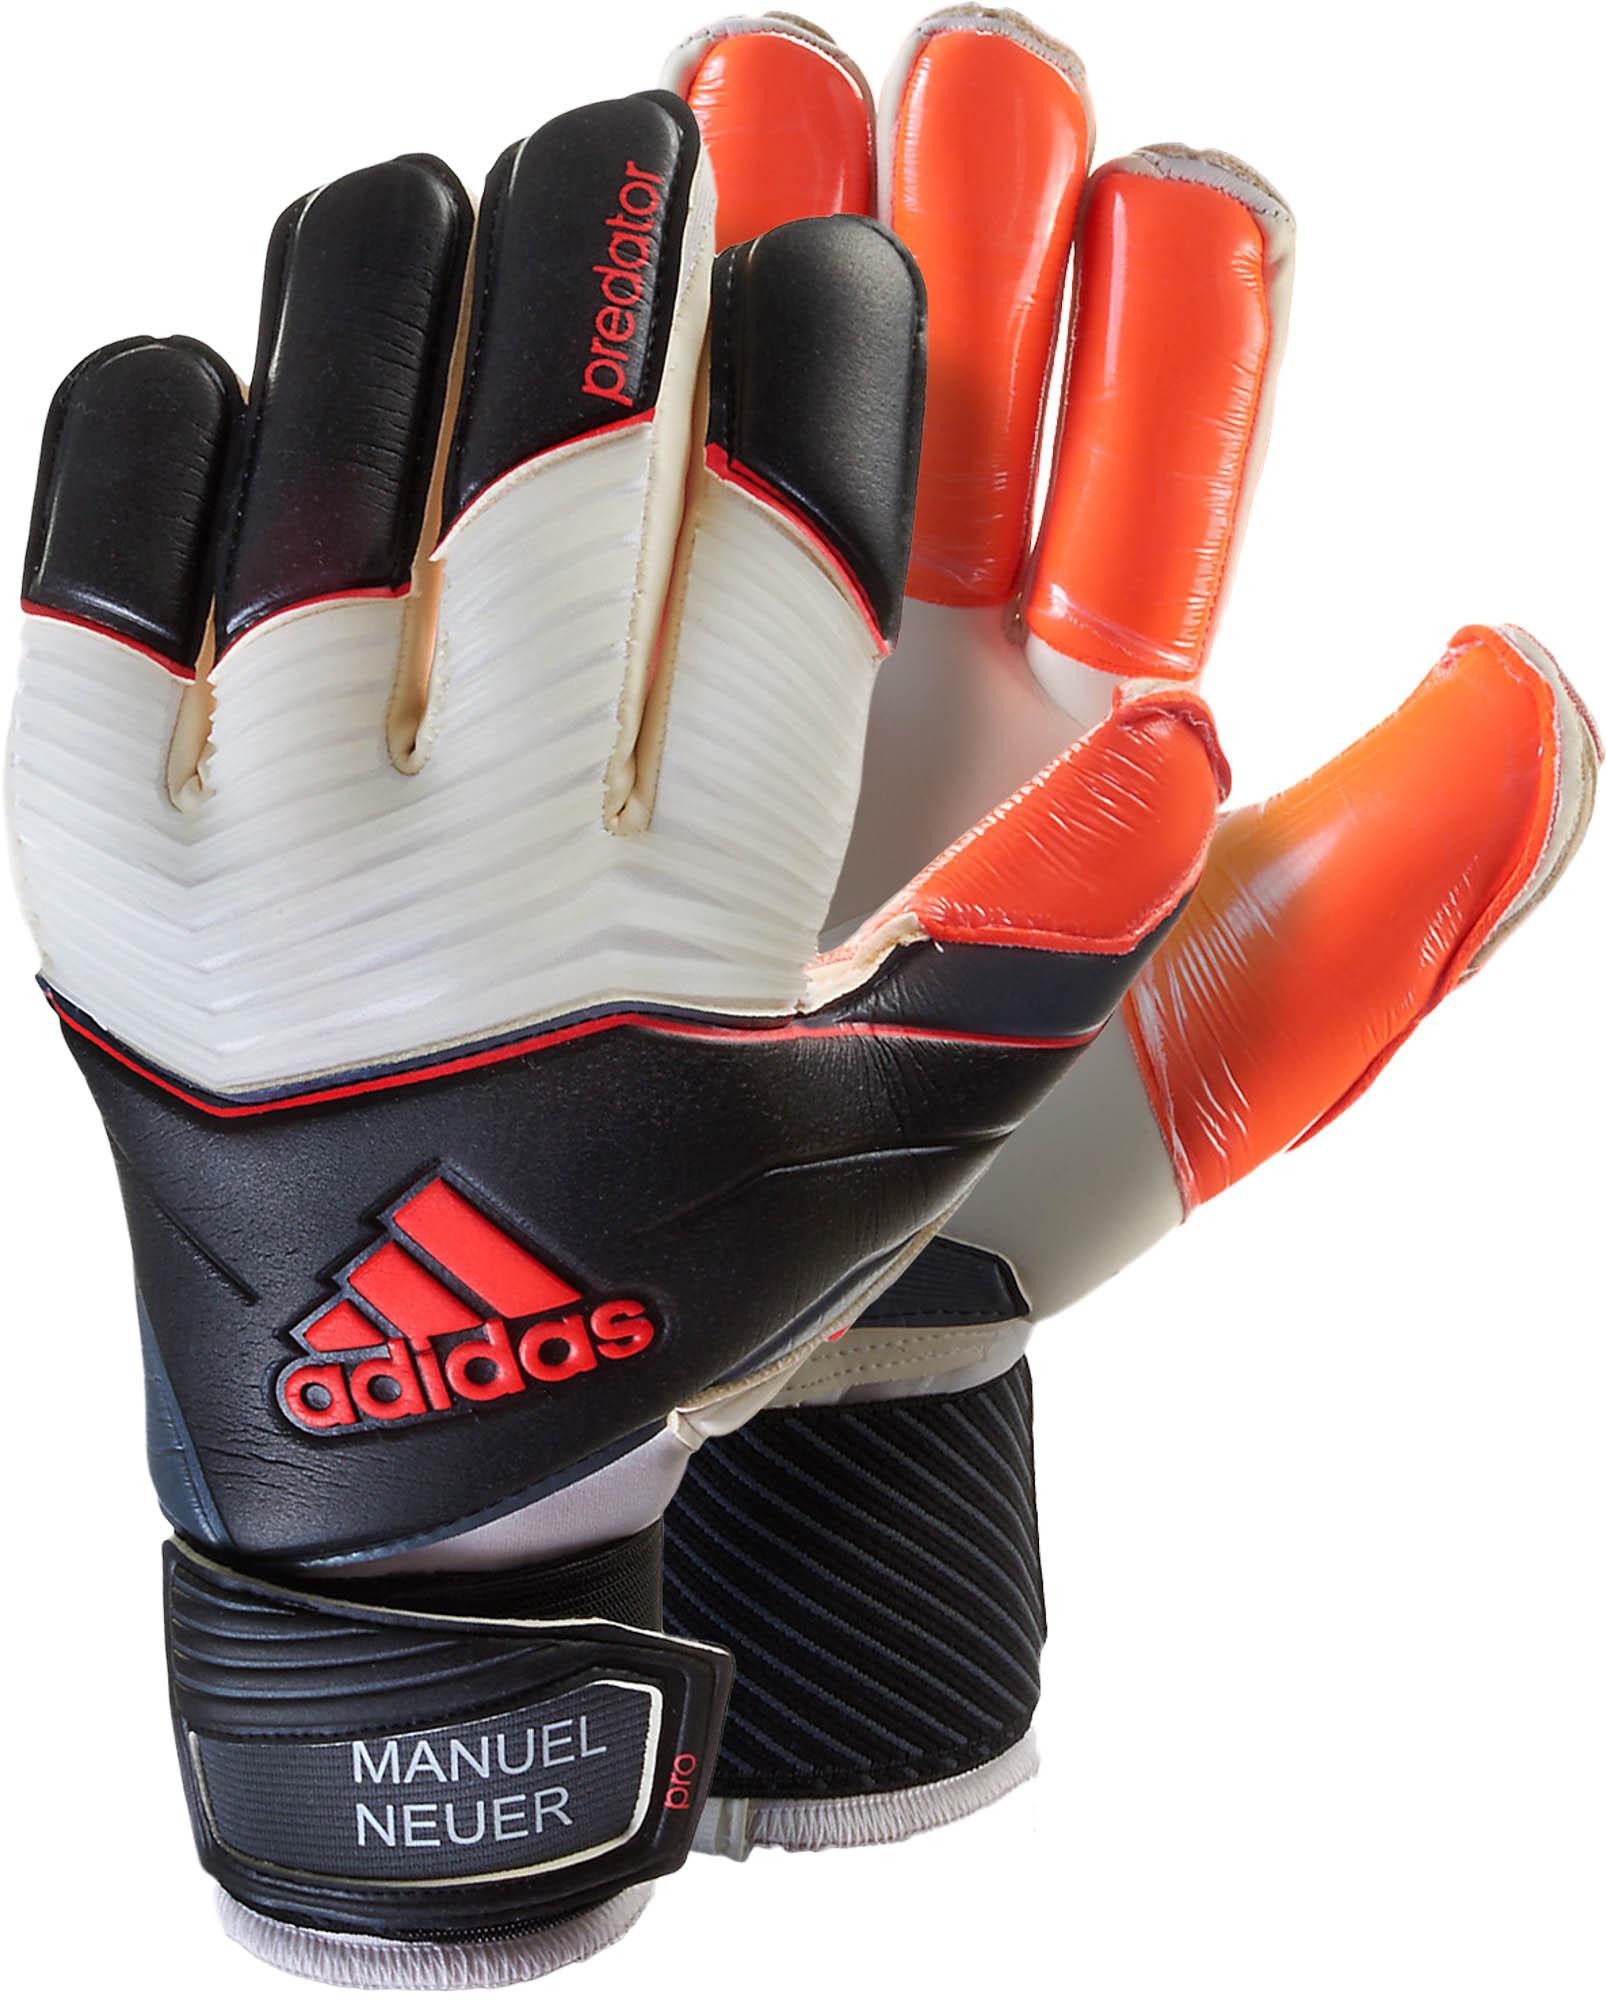 Nike Goalkeeper Gloves Youtube: Adidas Protator Zones Beast Gk Gloves Sneakerdiscount